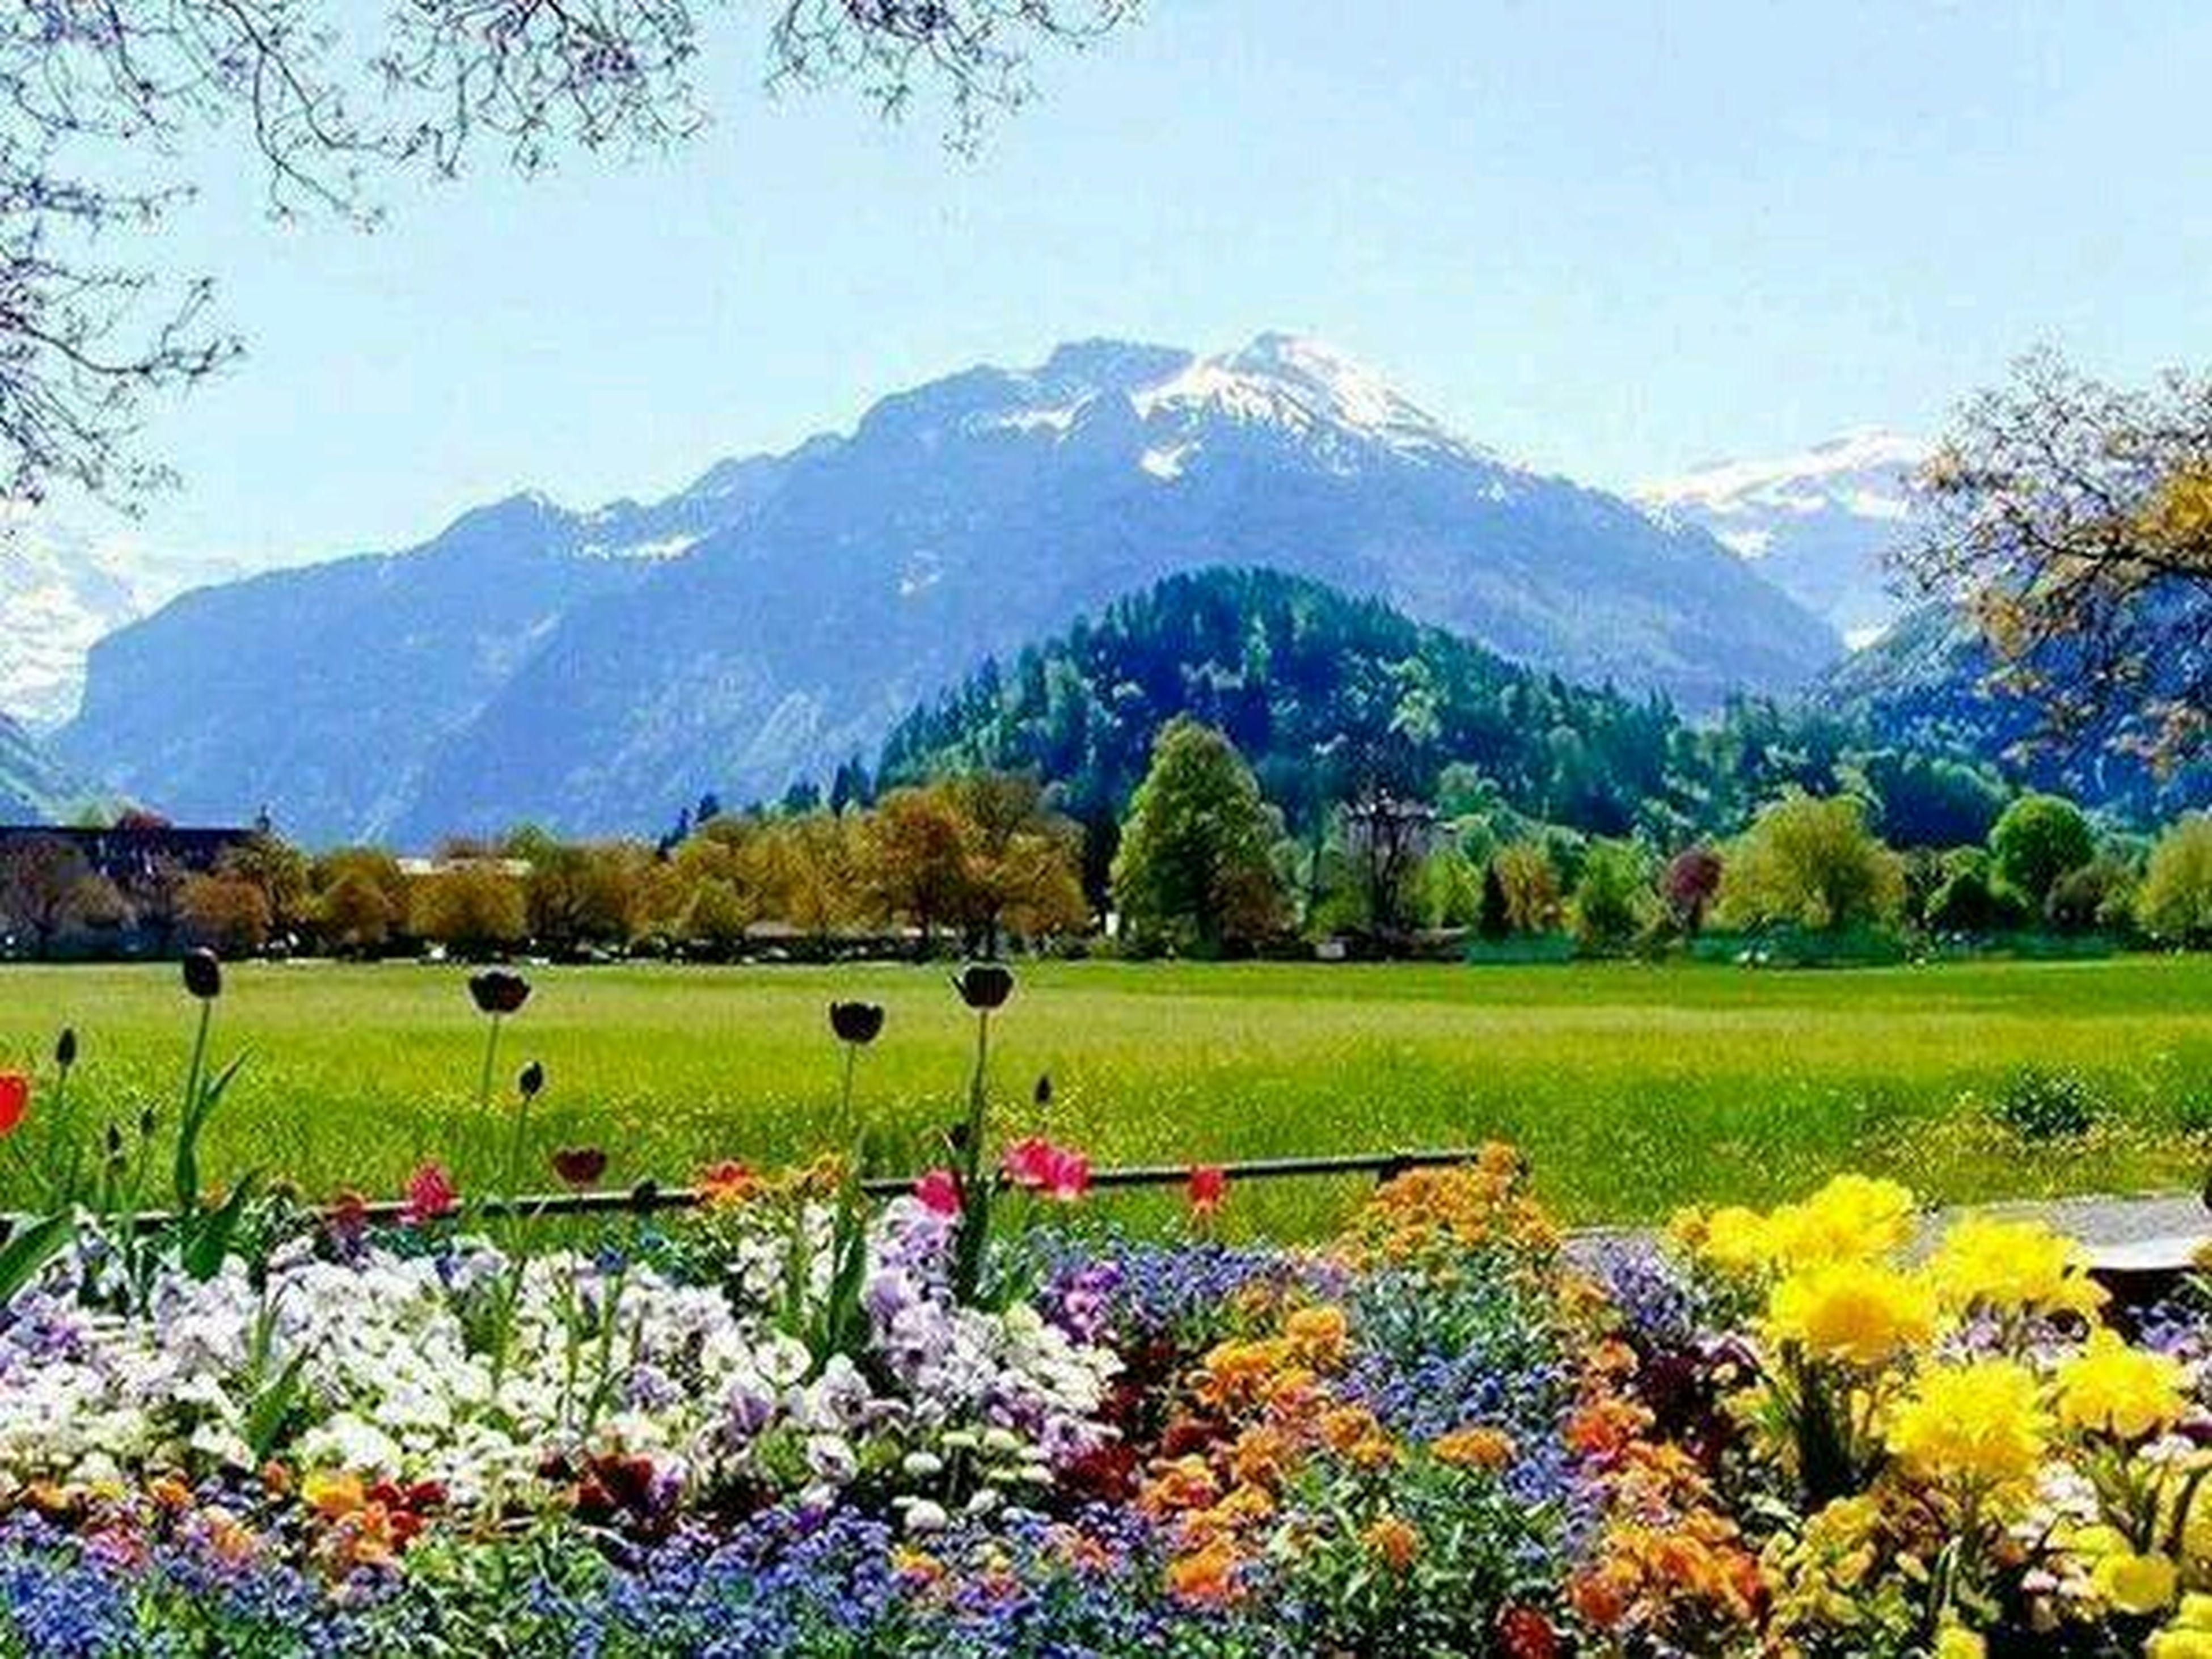 mountain, beauty in nature, landscape, tranquil scene, mountain range, flower, tranquility, scenics, field, nature, tree, growth, clear sky, grass, sky, season, rural scene, non-urban scene, plant, idyllic